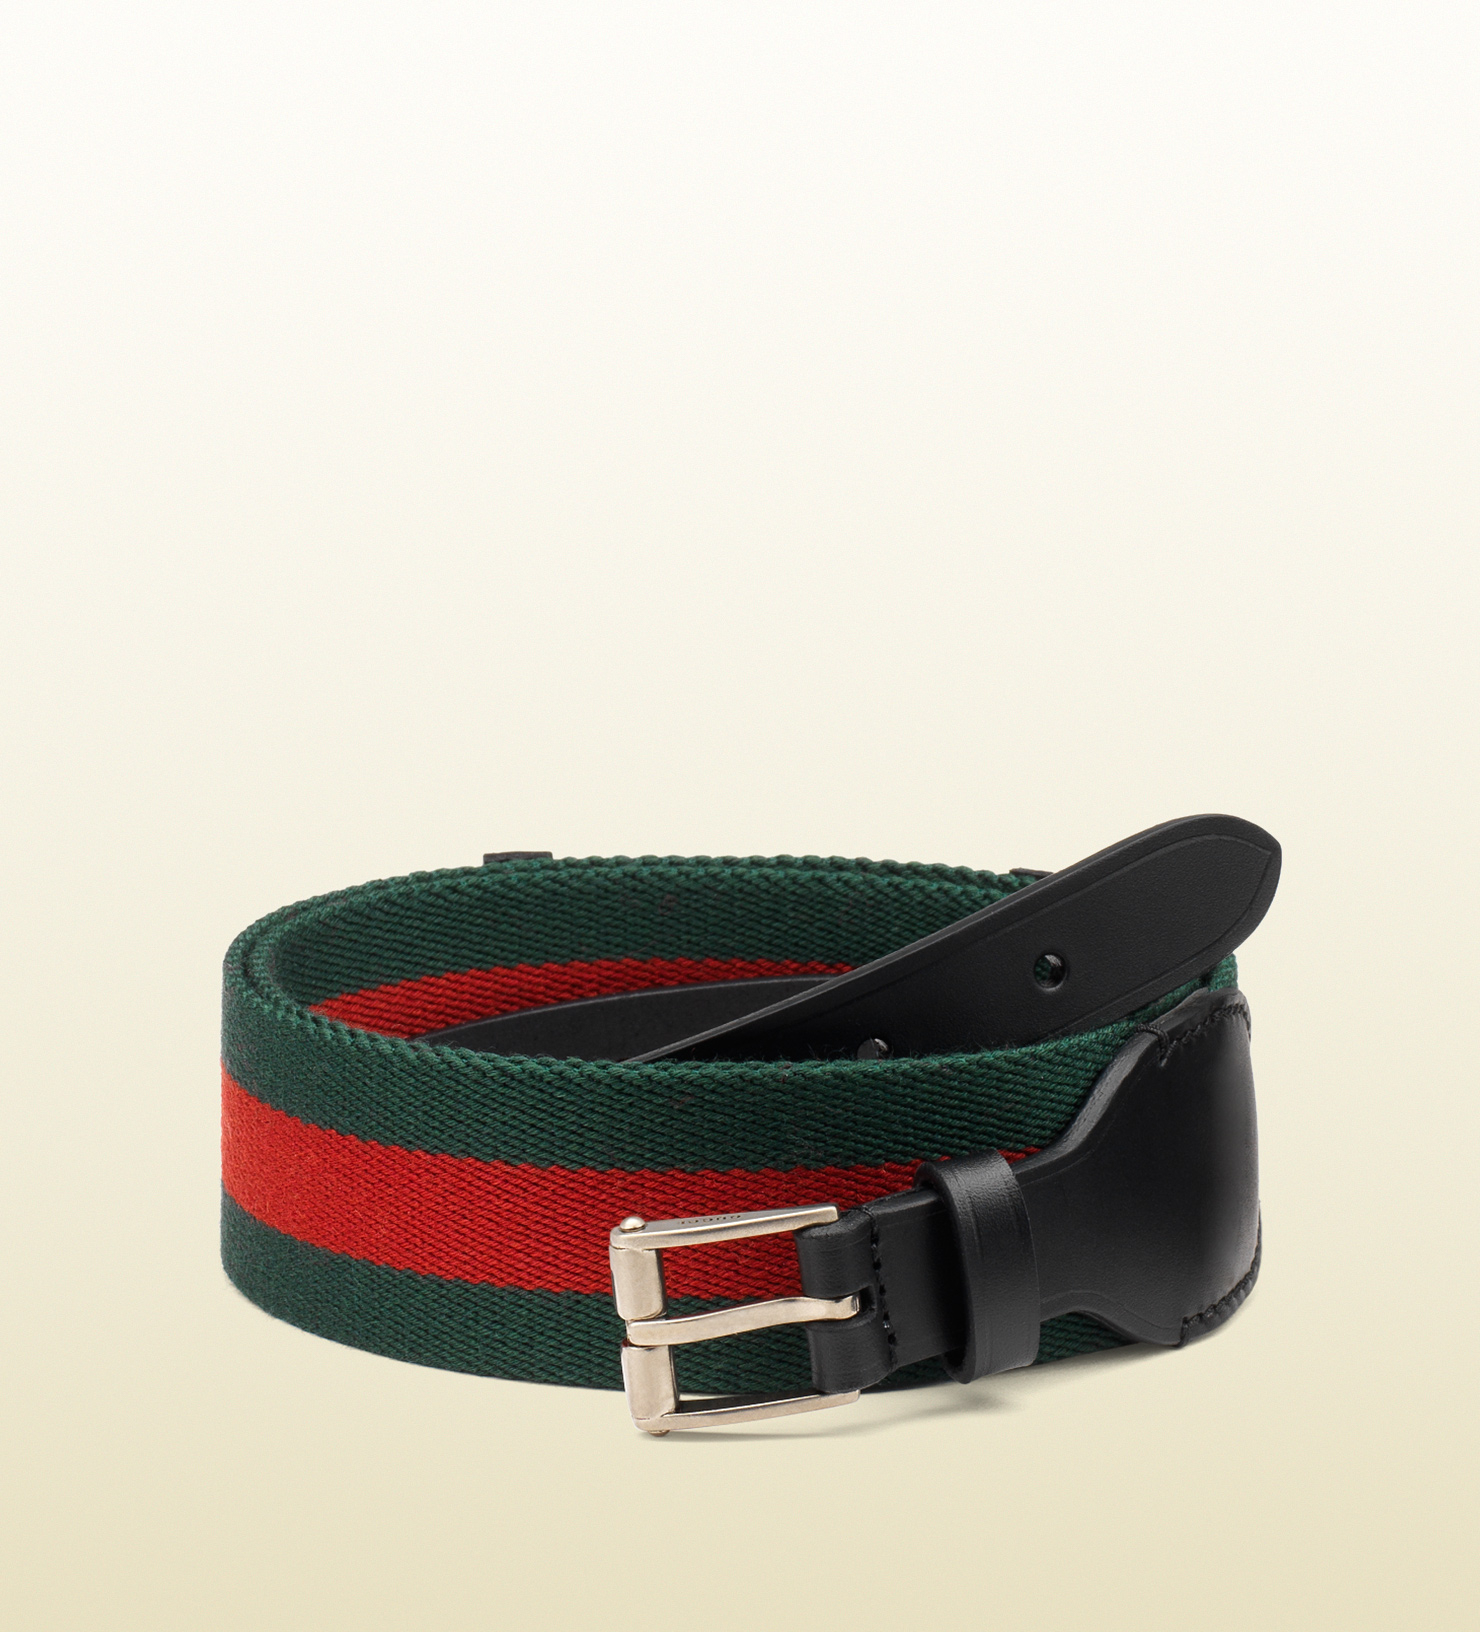 e15fcfe0a4ee5 Lyst - Gucci Signature Web Belt in Green for Men